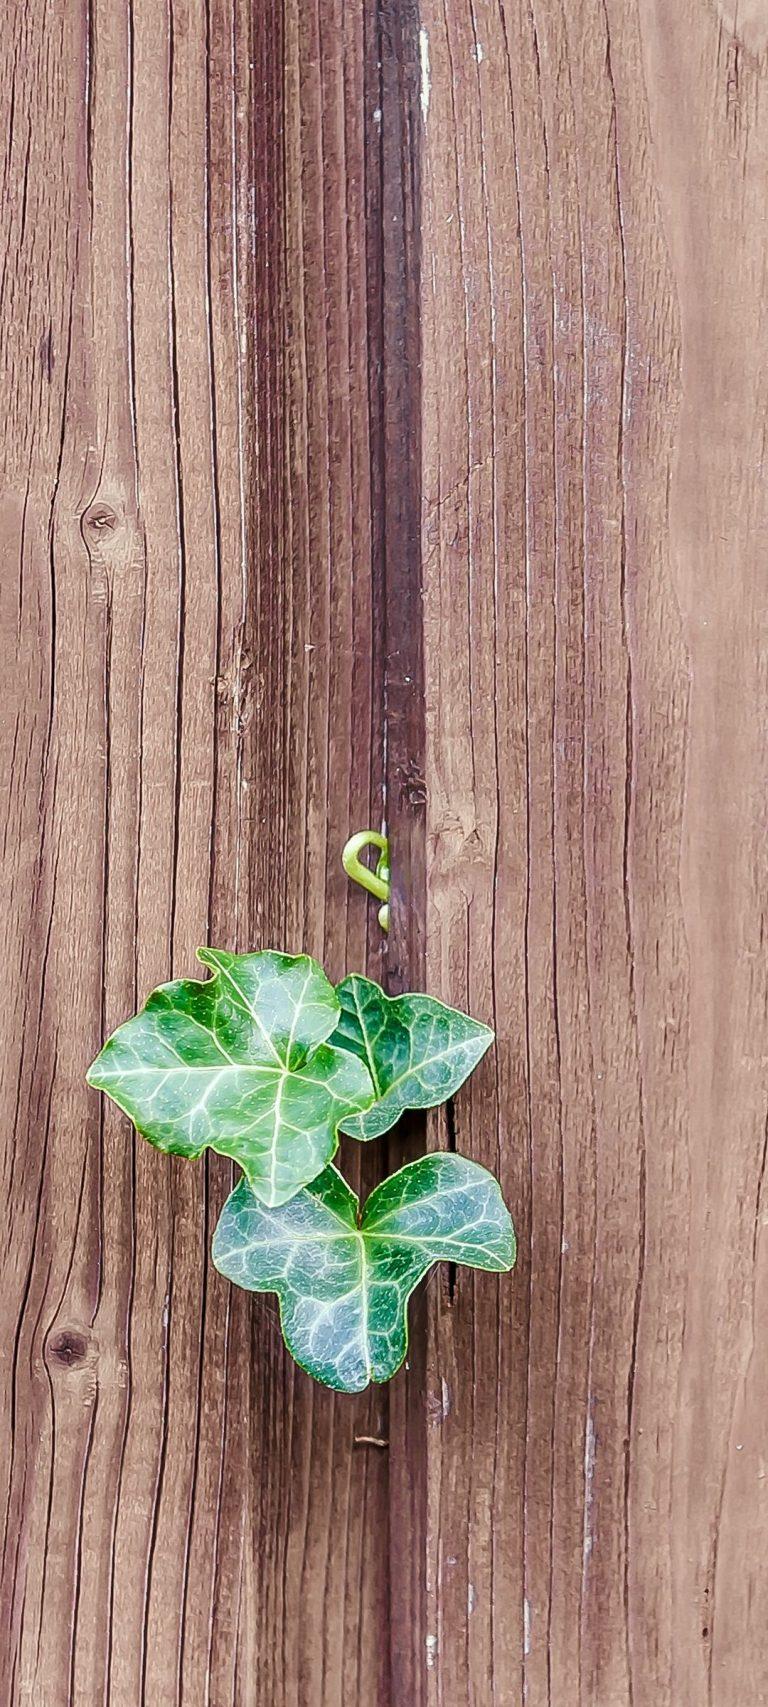 Walls Fences Boards Leaves Plants 1080x2400 768x1707